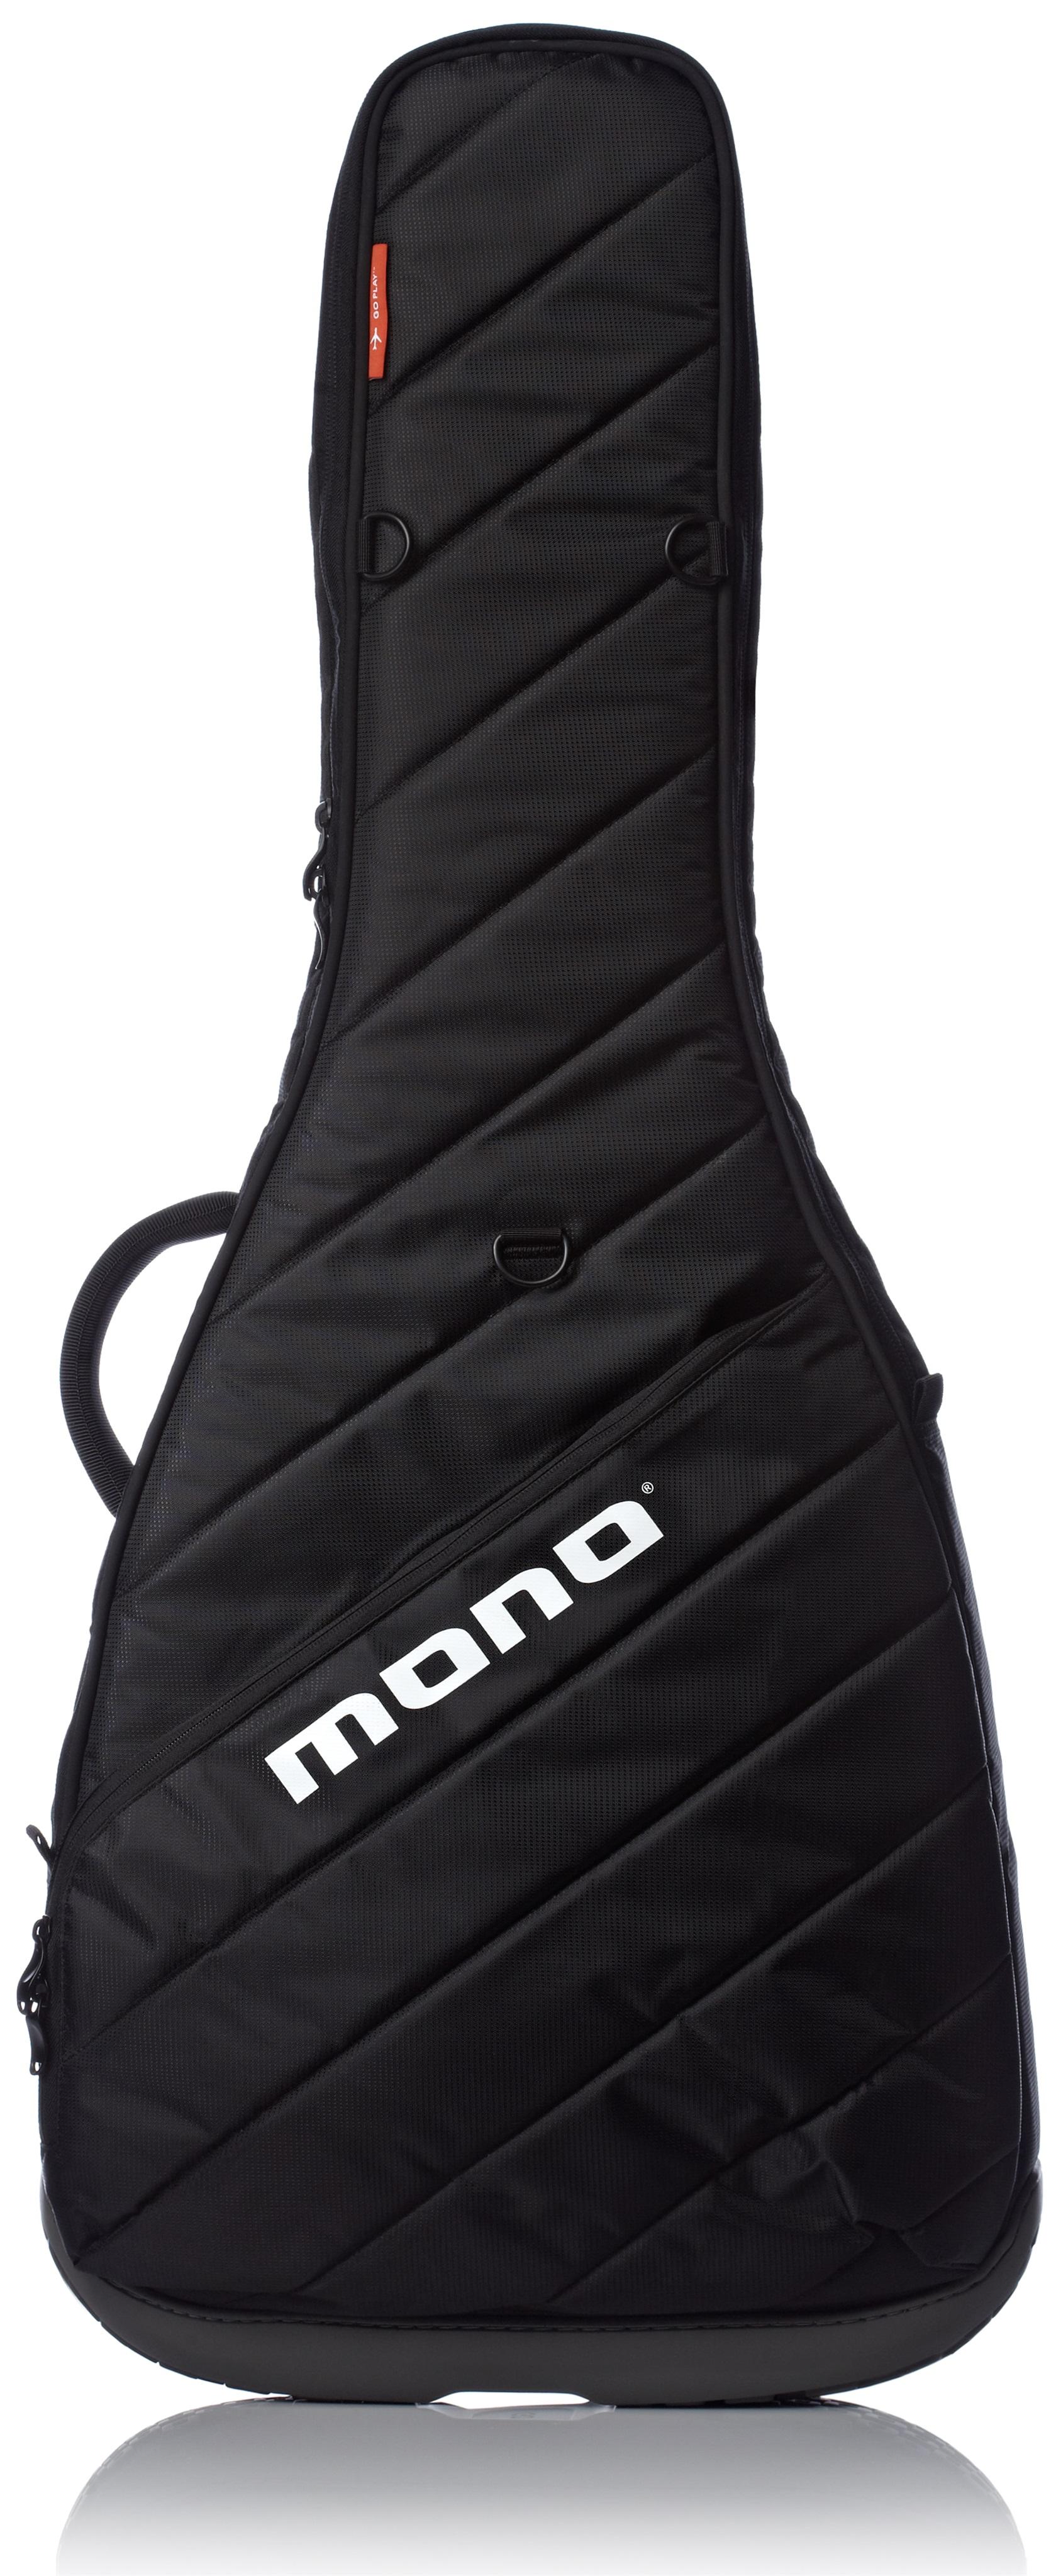 Mono M80-VHB-BLK